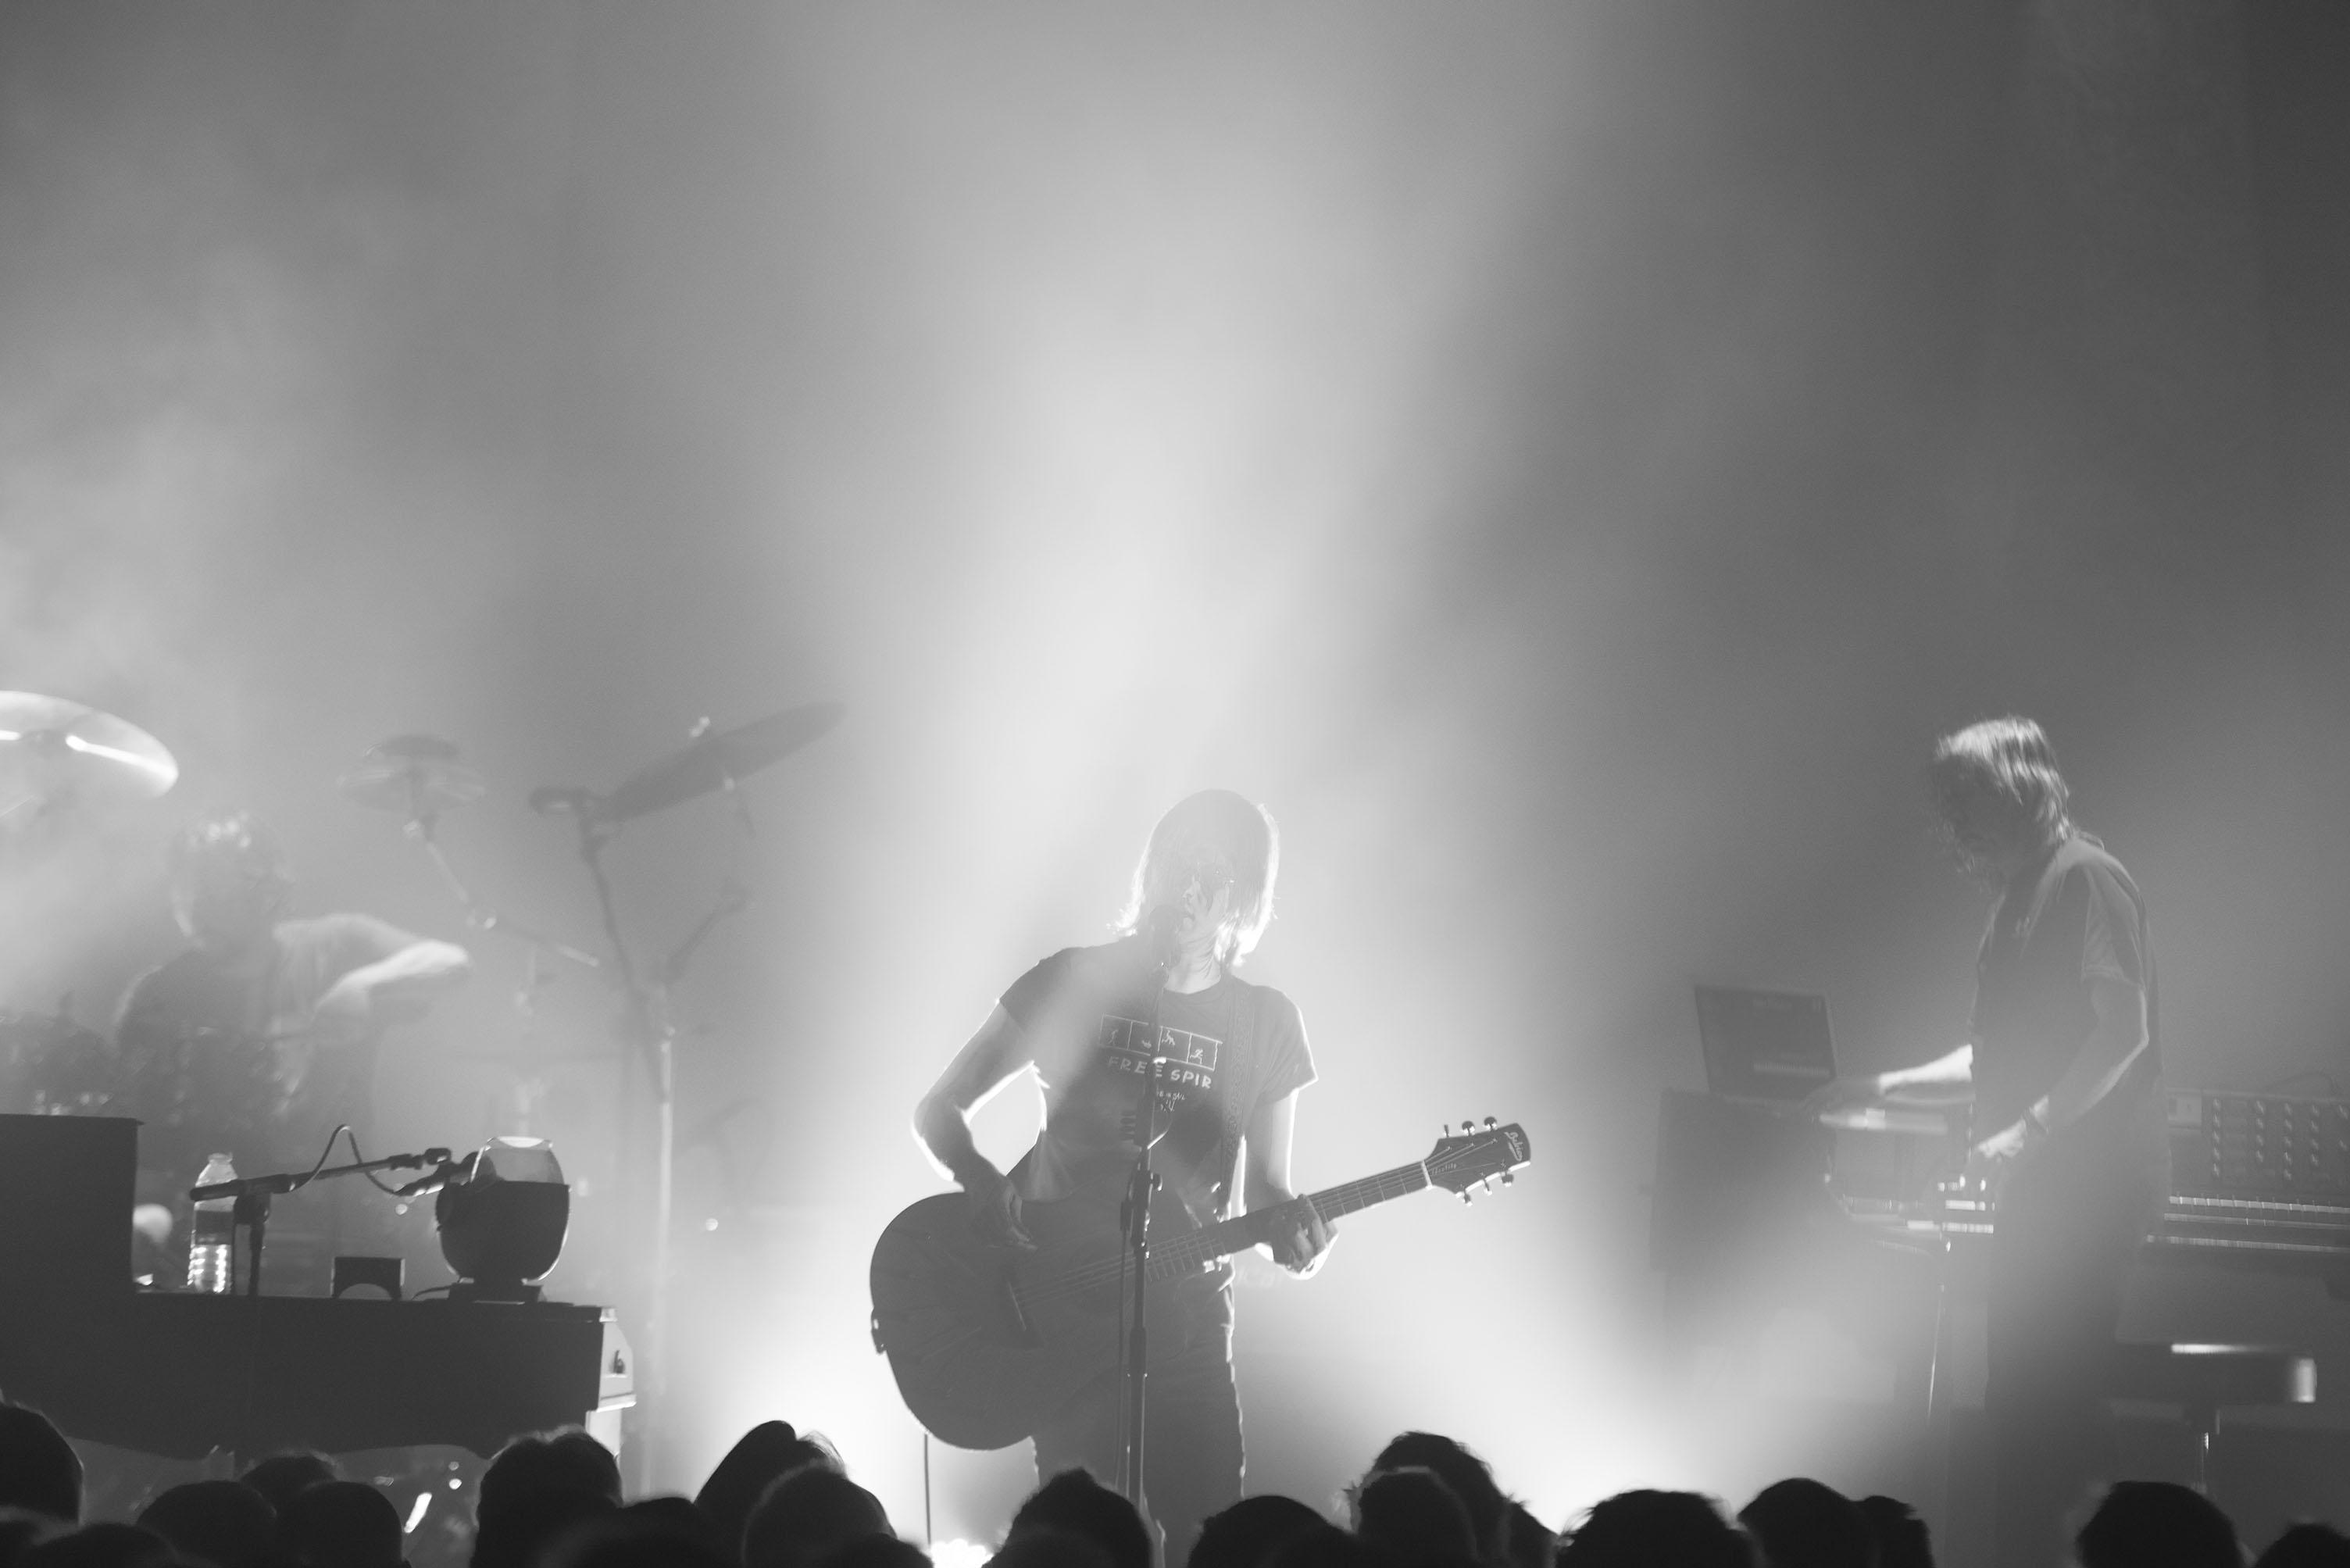 Steven wilson - performance, montreal, april 25, 2013